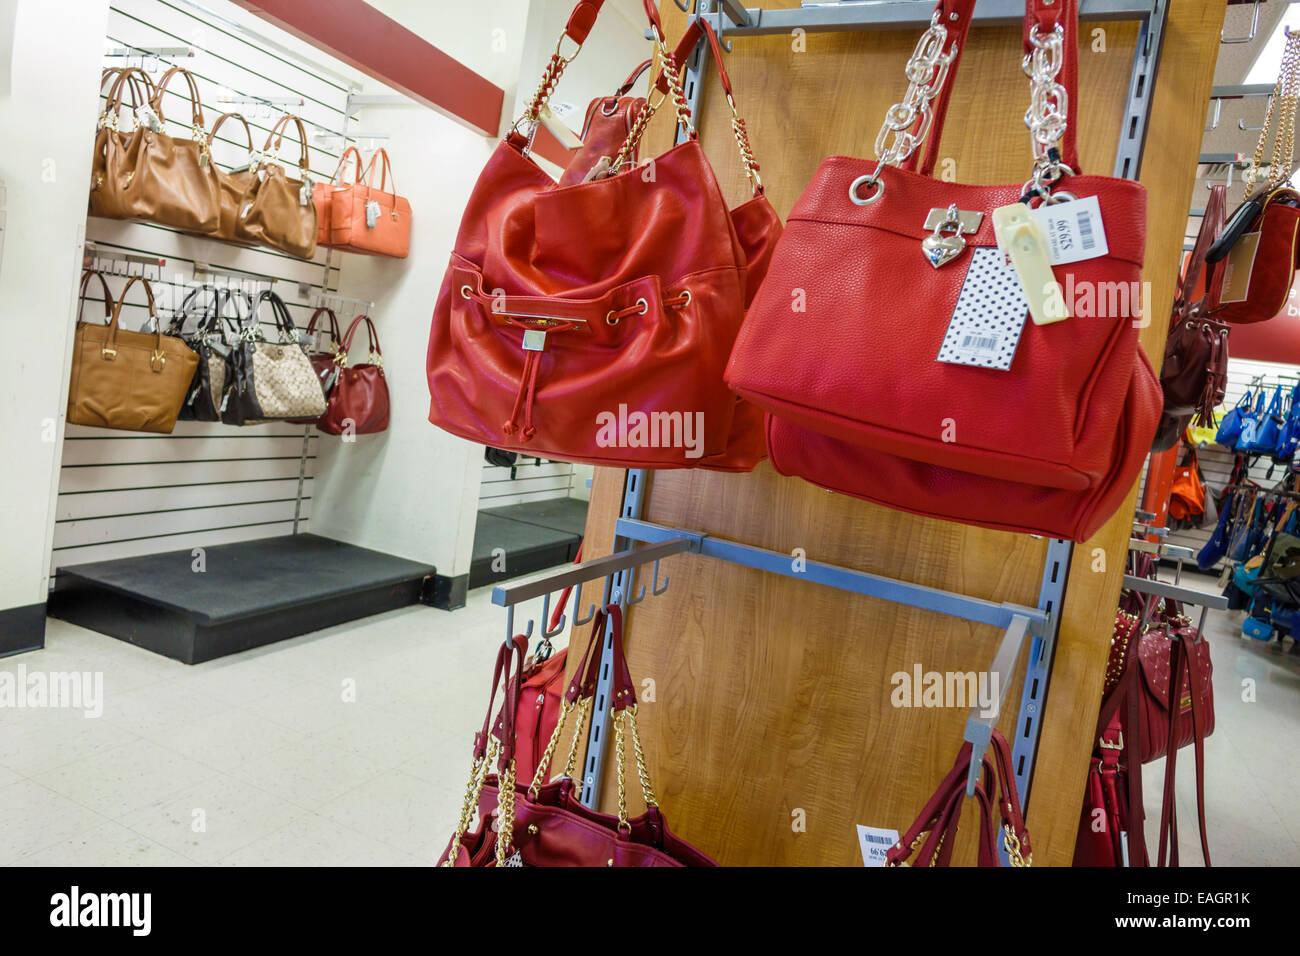 Discount Handbags Store Stock Photos & Discount Handbags Store Stock